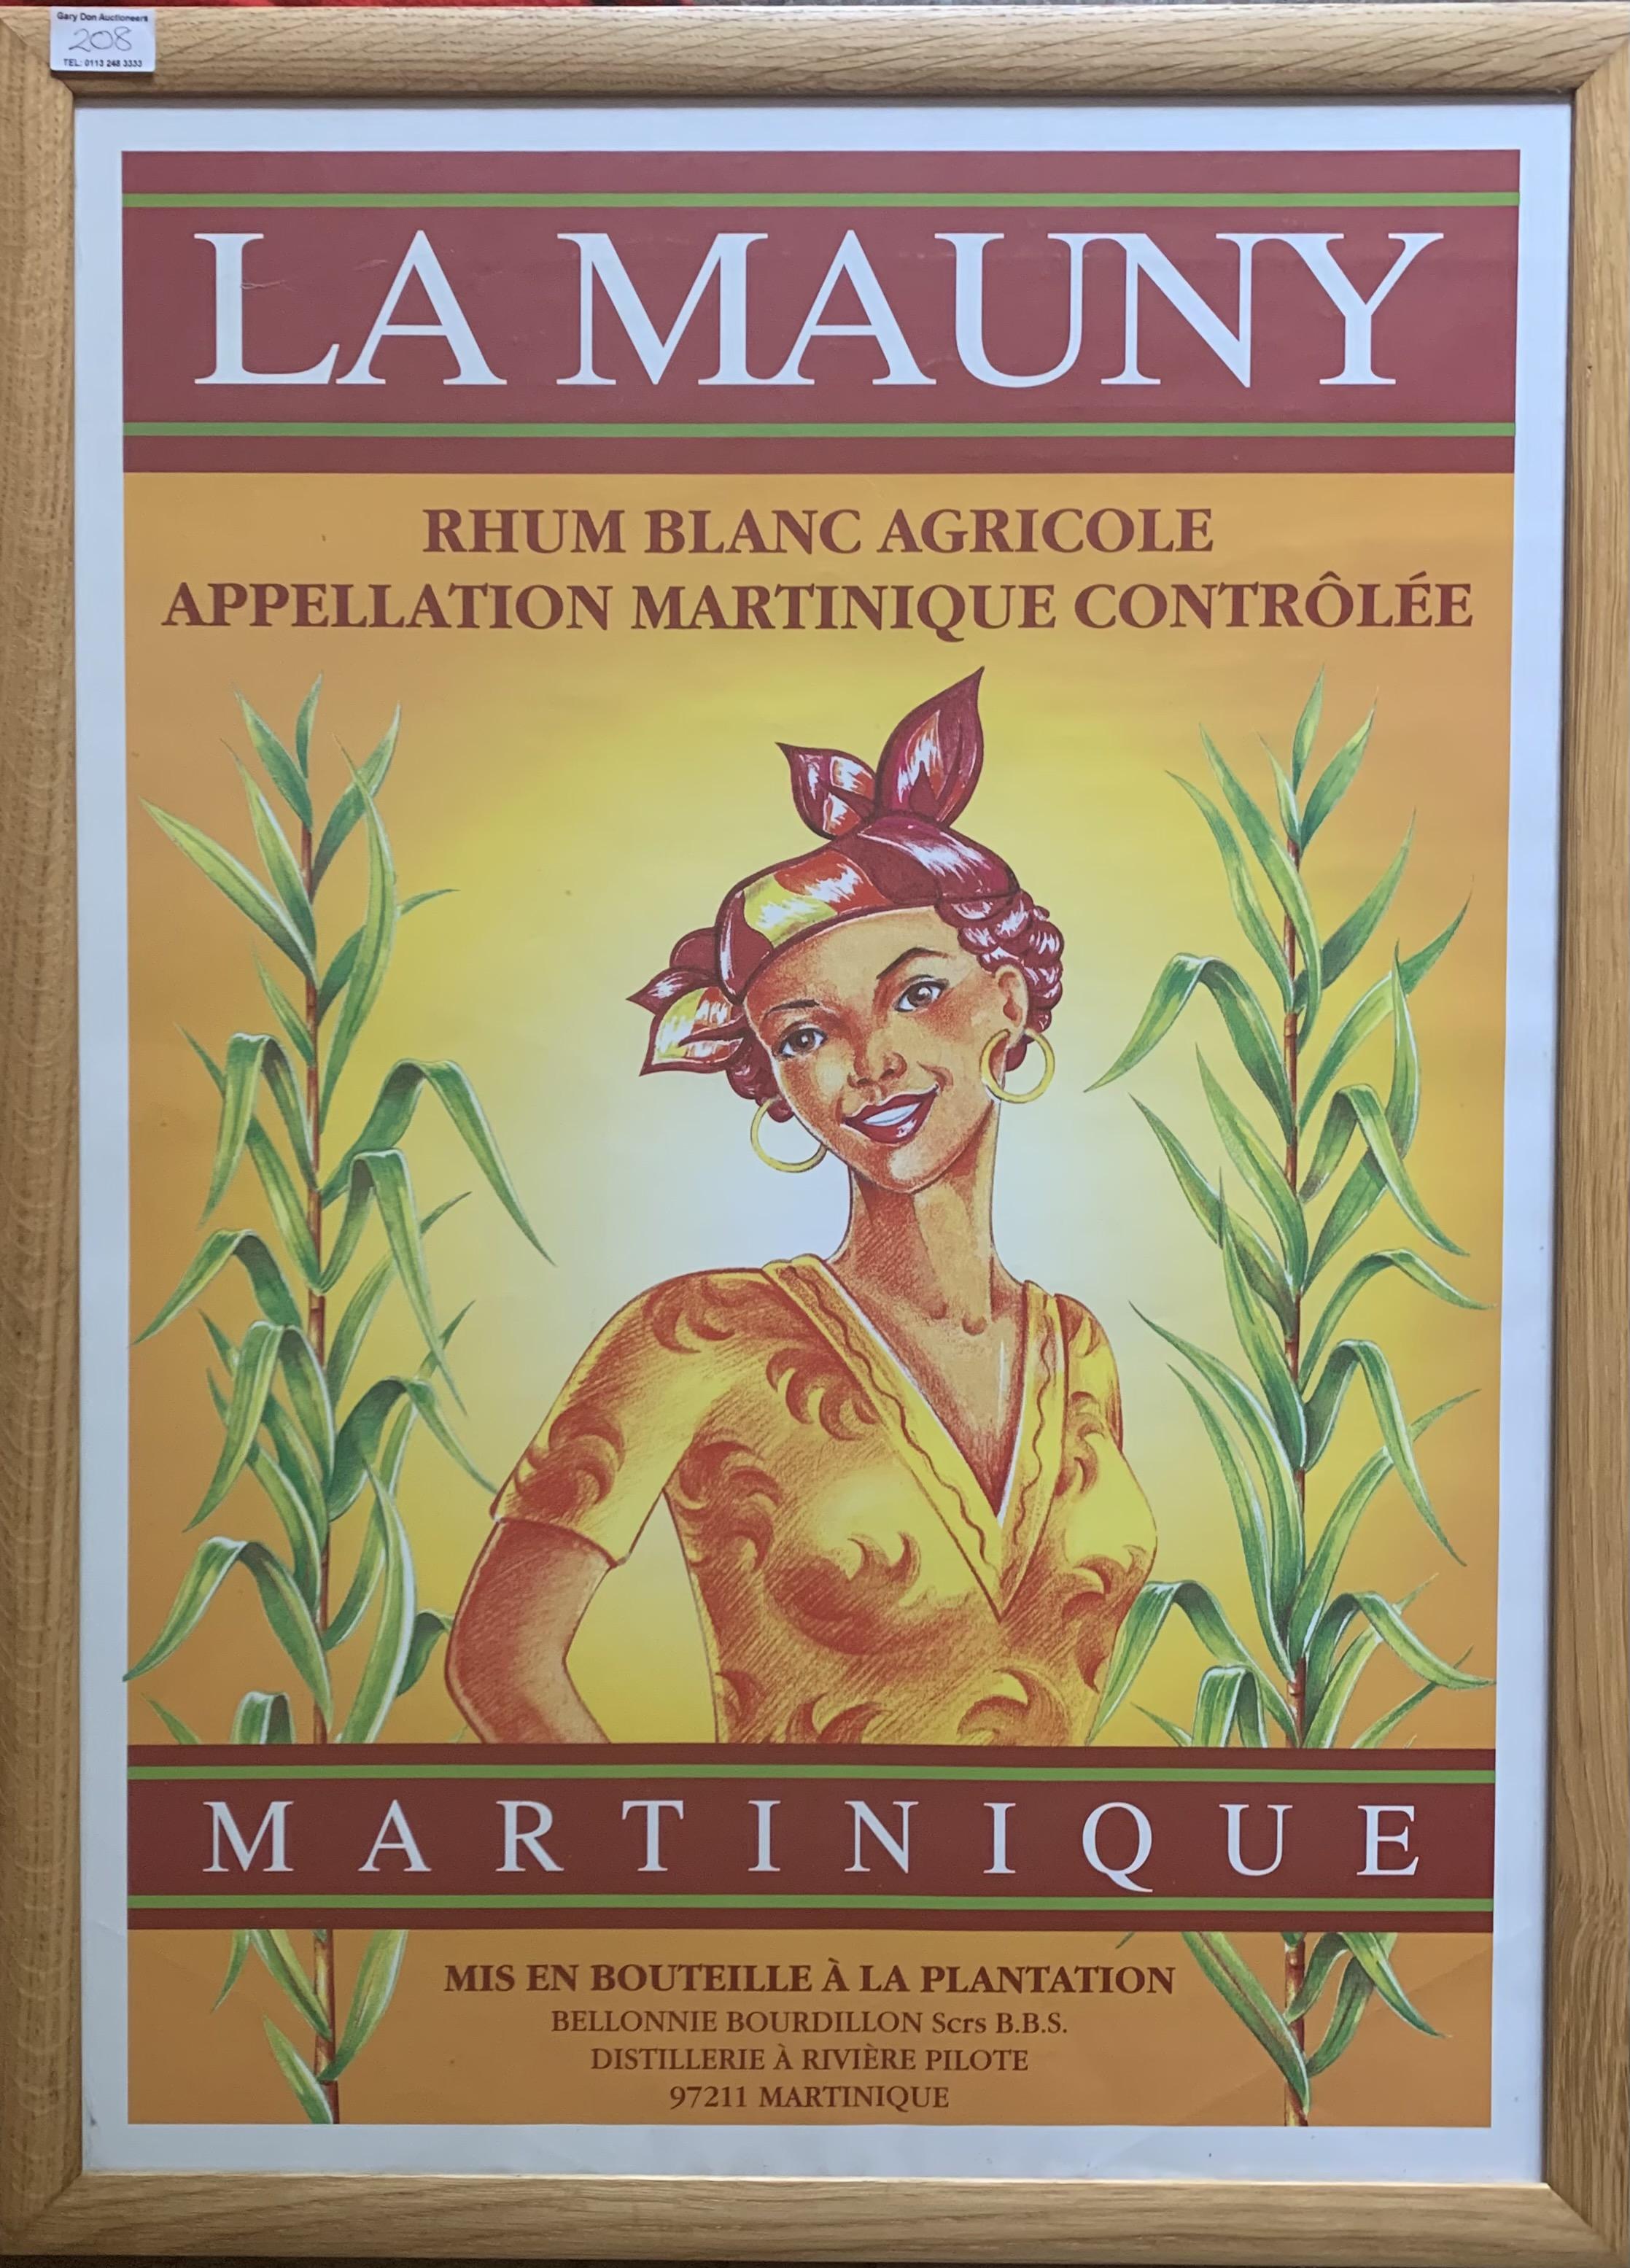 "Advertising poster – La Mauny, Rhum Blanc Agricole, Martinique. Image 18"" x 26"", frame 21.5"" x 29."